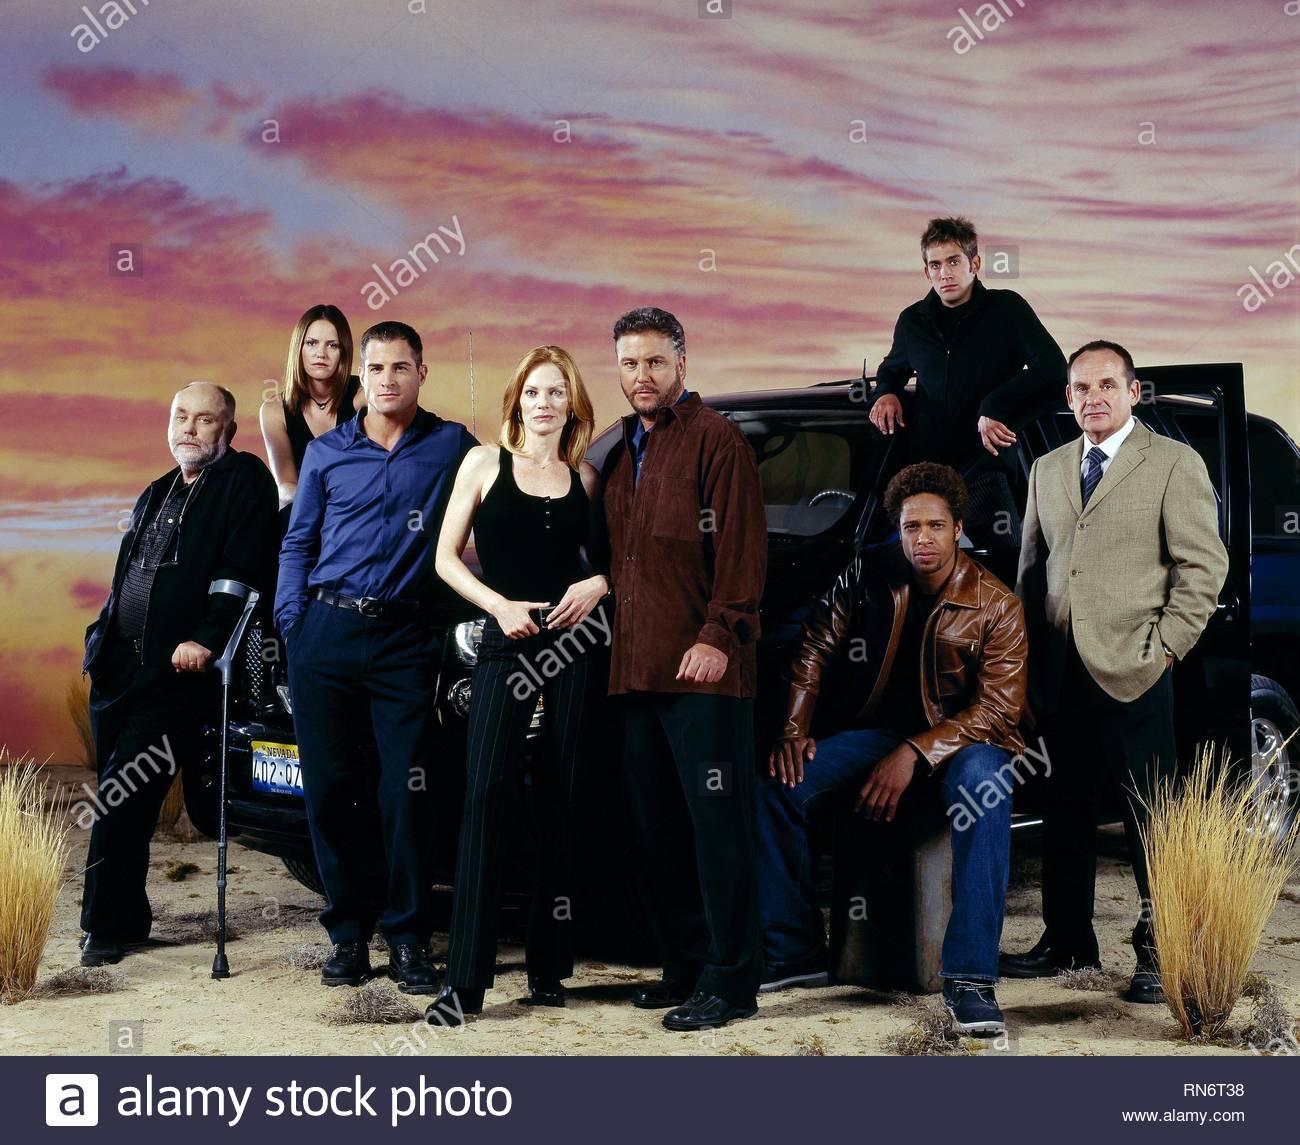 CSI: CRIME SCENE INVESTIGATION, ROBERT DAVID HALL, JORJA FOX, GEORGE EADS, MARG HELGENBERGER, WILLIAM L. PETERSEN, GARY DOURDAN, ERIC SZMANDA - Stock Image